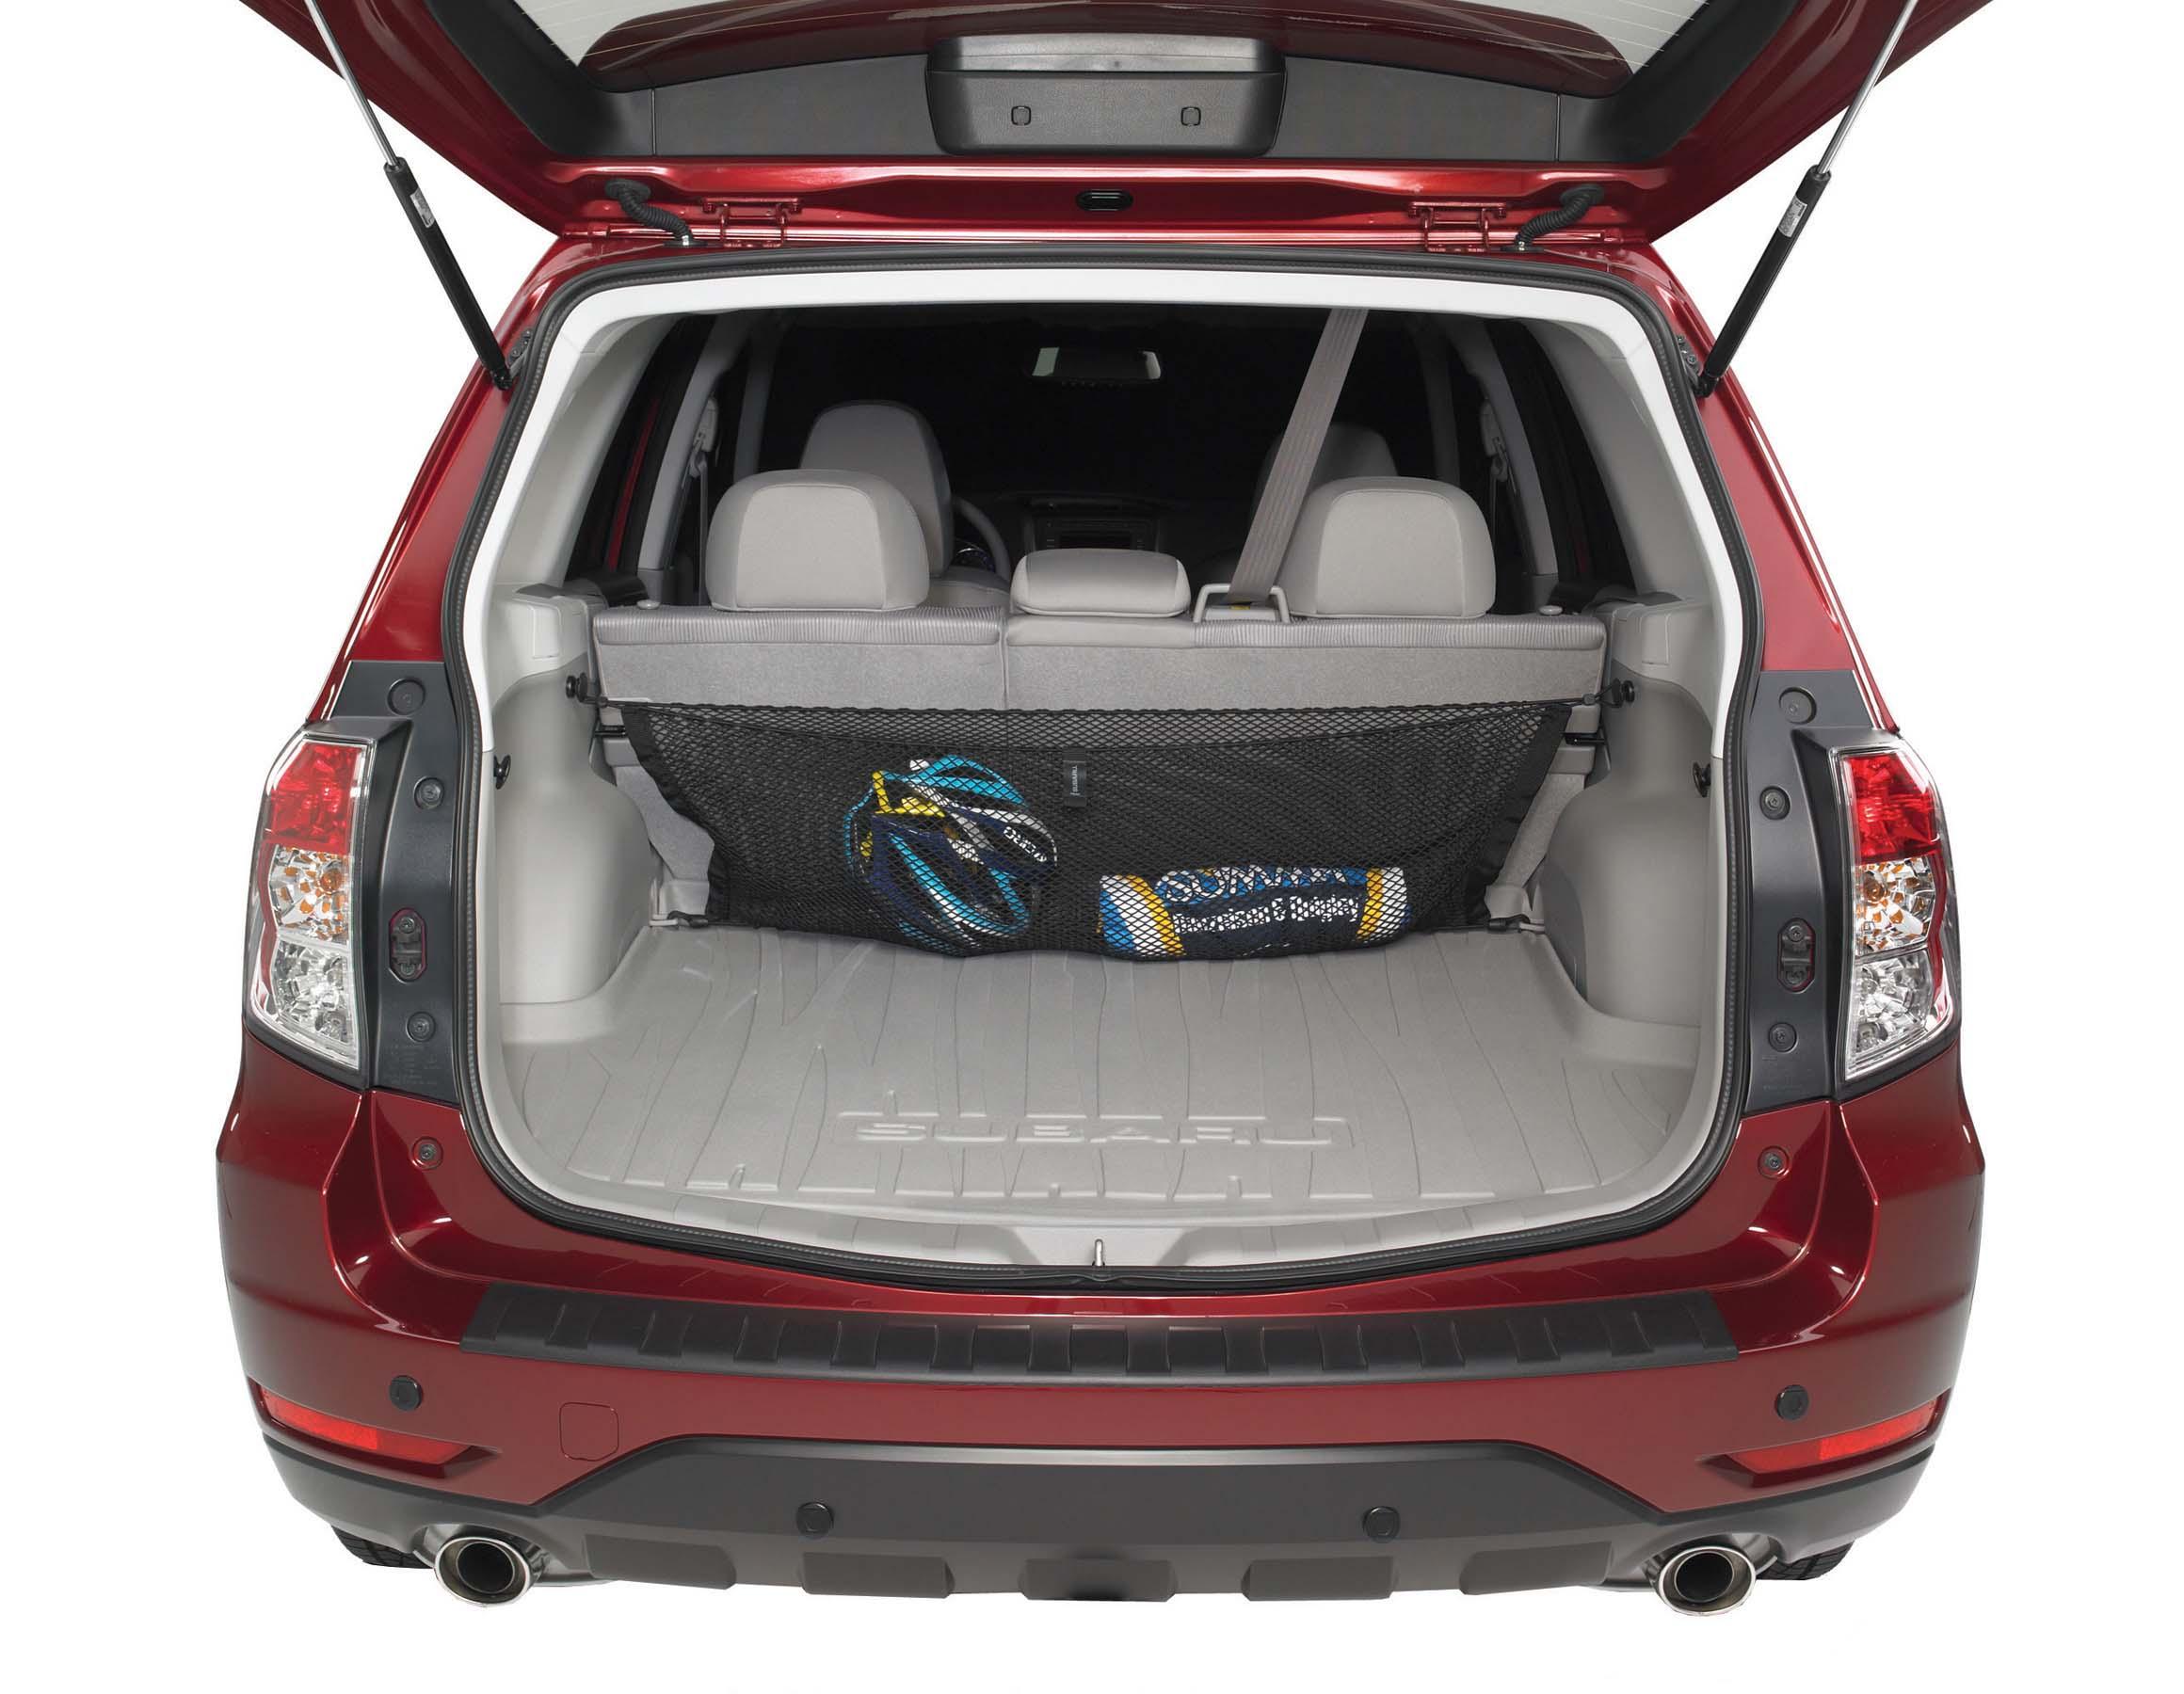 2010 subaru forester cargo net seat back interior for Colorado springs motor vehicle registration